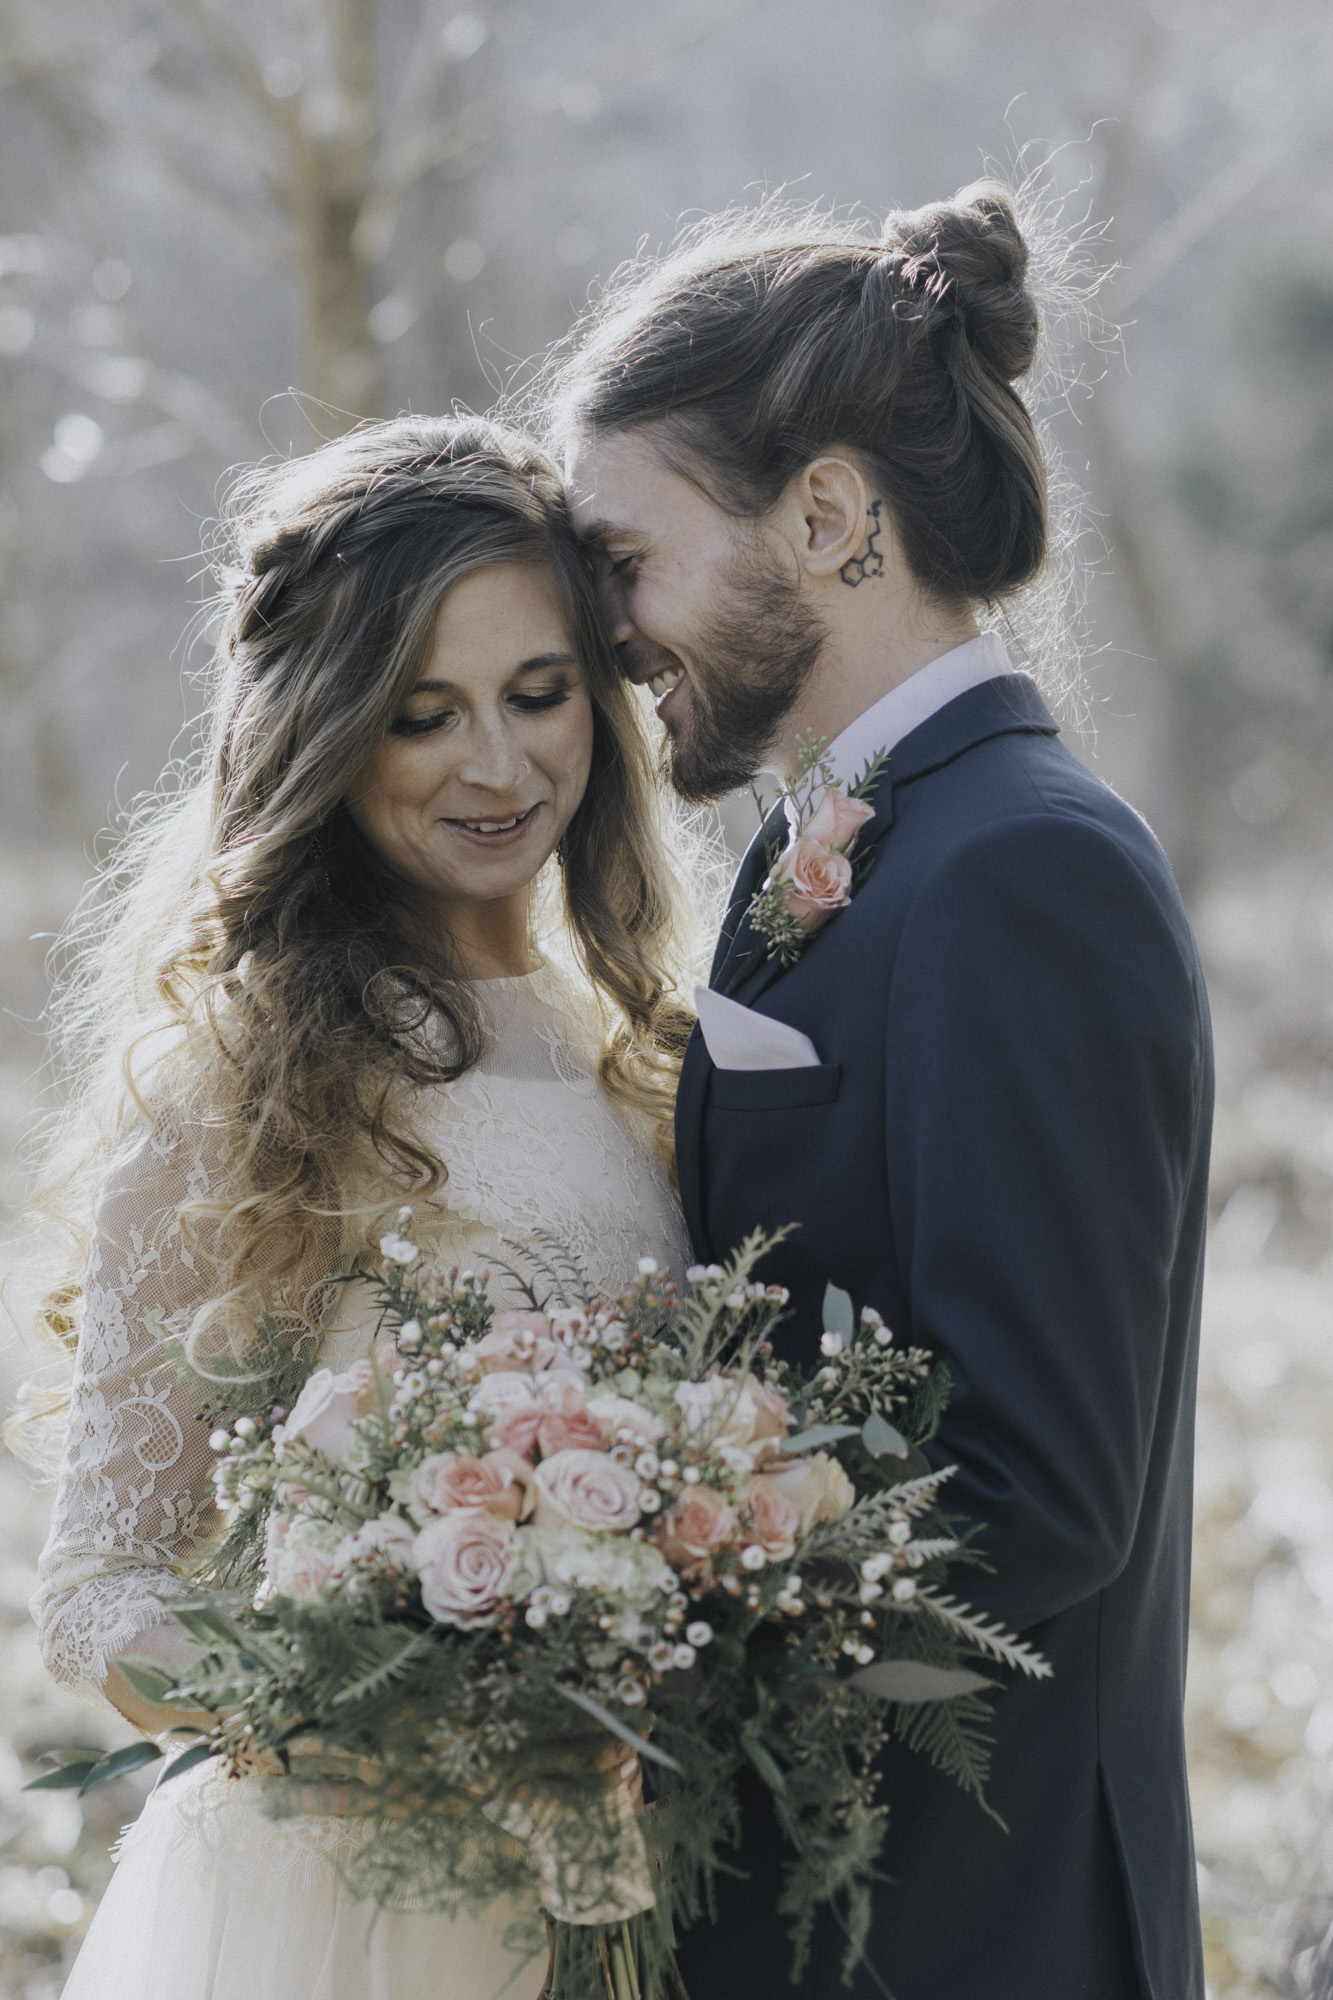 Cate_Ann_Photography_Dayton_Ohio_Wedding_Elopement_And_Engagement_PhotographerDSC_5800.jpg